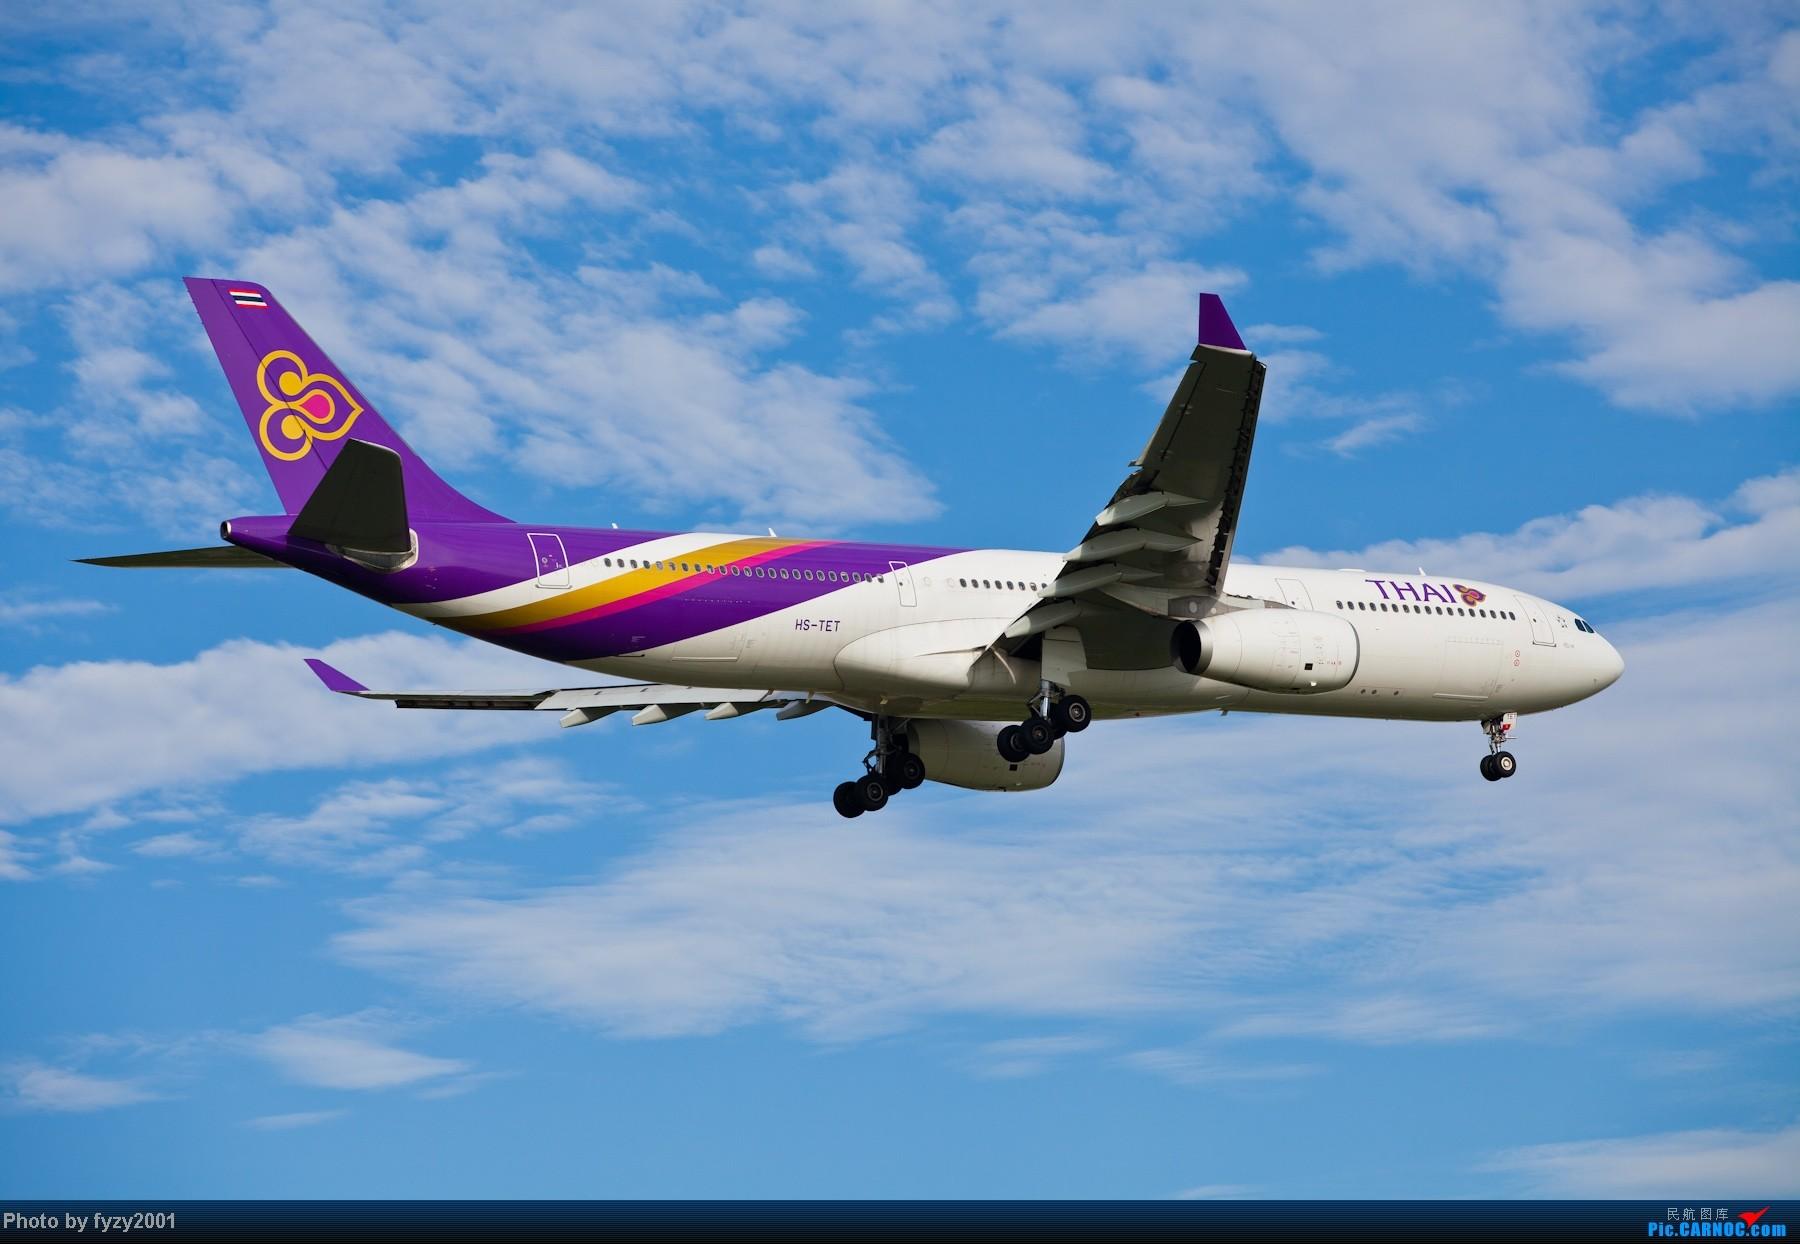 Re:[原创][无锡西站]一周之内SHA&PVG追逐美好光线……多图党,不知你的电脑能承受多少张1800(更新ing)~~~~~ AIRBUS A330-300 HS-TET 中国上海浦东机场